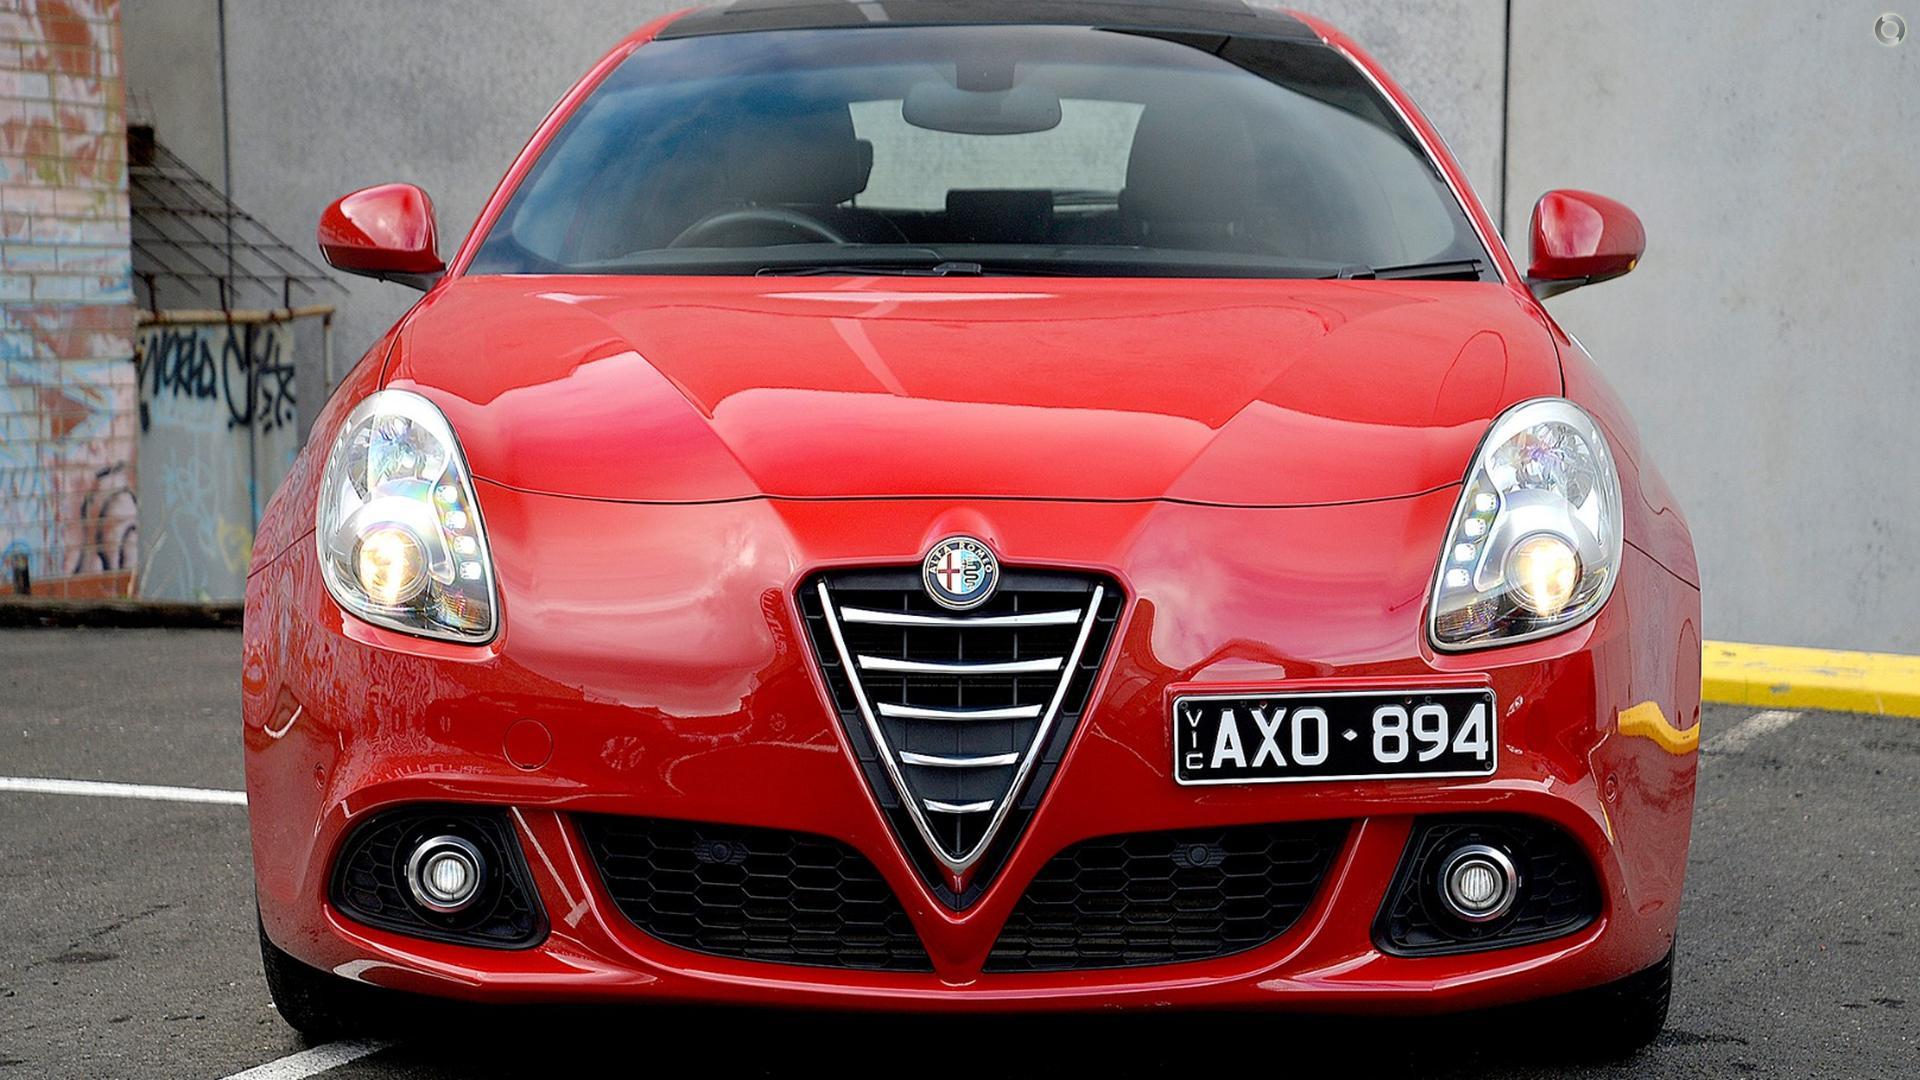 2014 Alfa Romeo Giulietta Distinctive Series 0